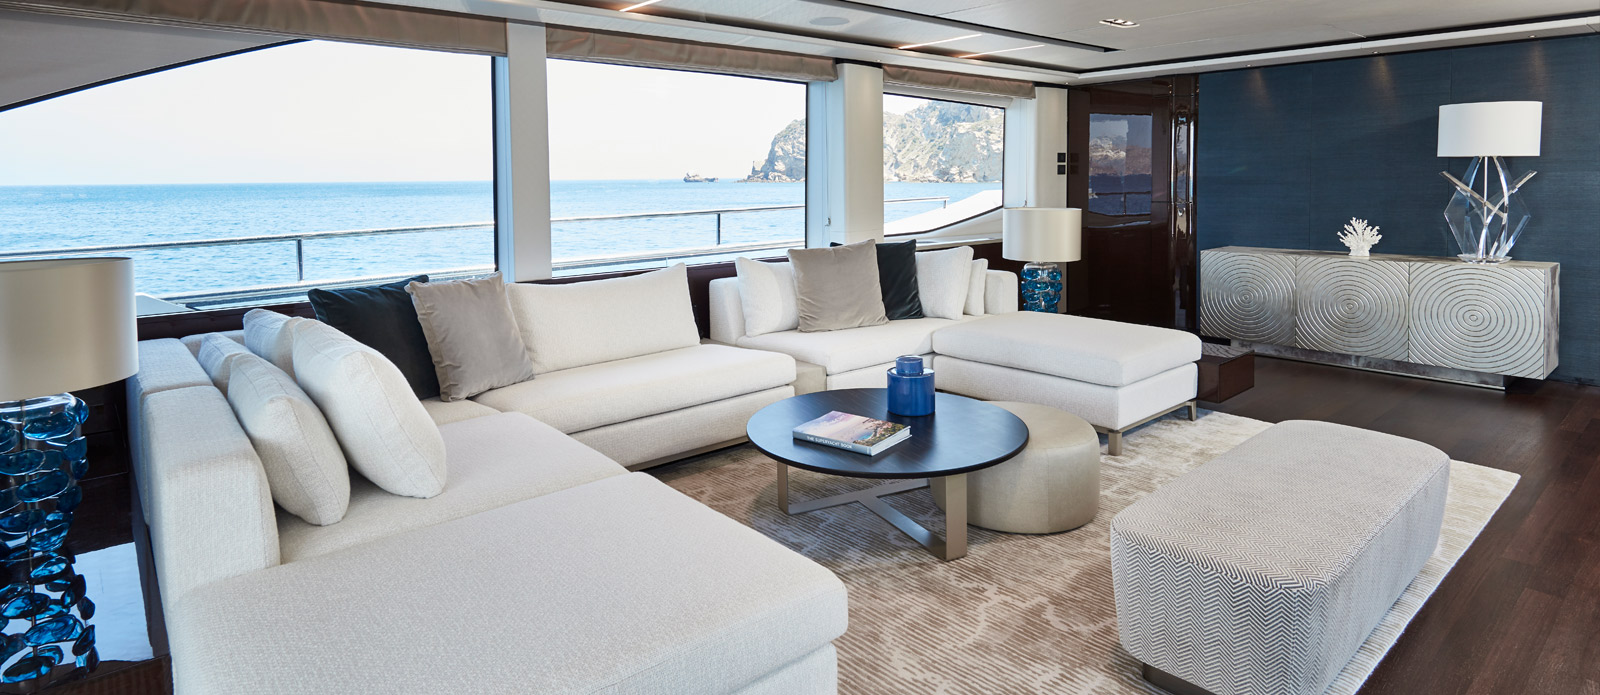 Princess 30 Metre Yacht Bandazul - Saloon